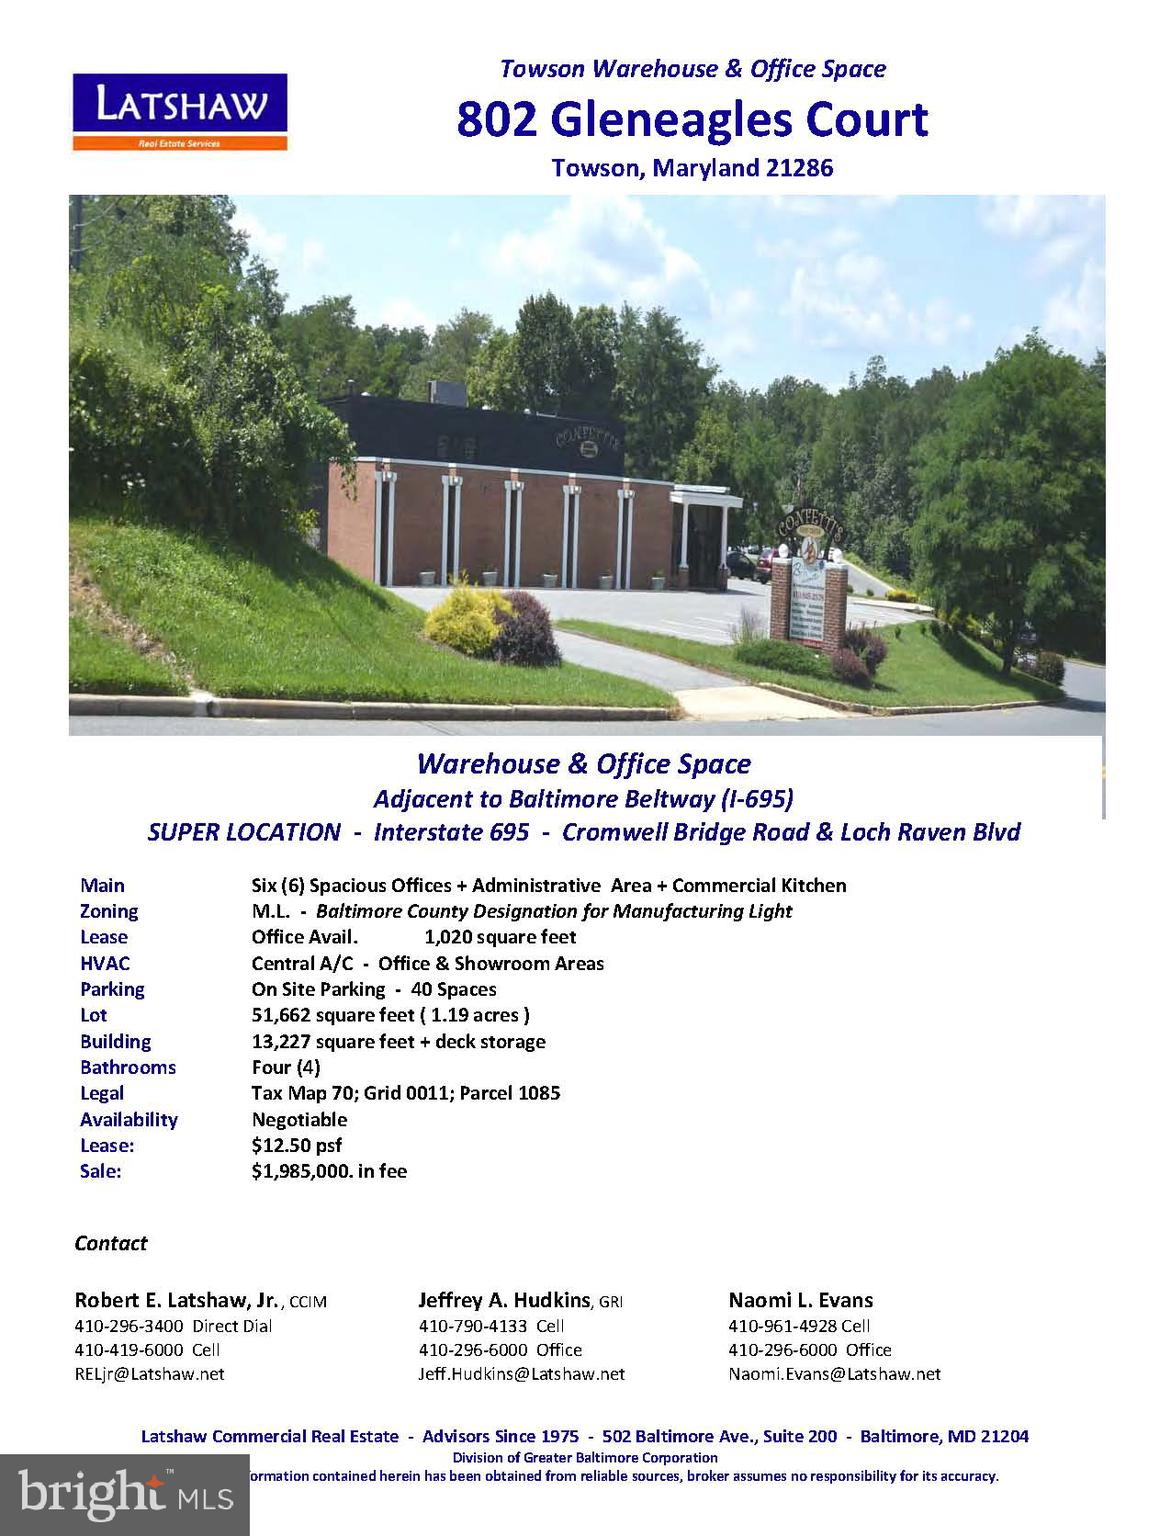 802 GLENEAGLE COURT, TOWSON, MD 21286